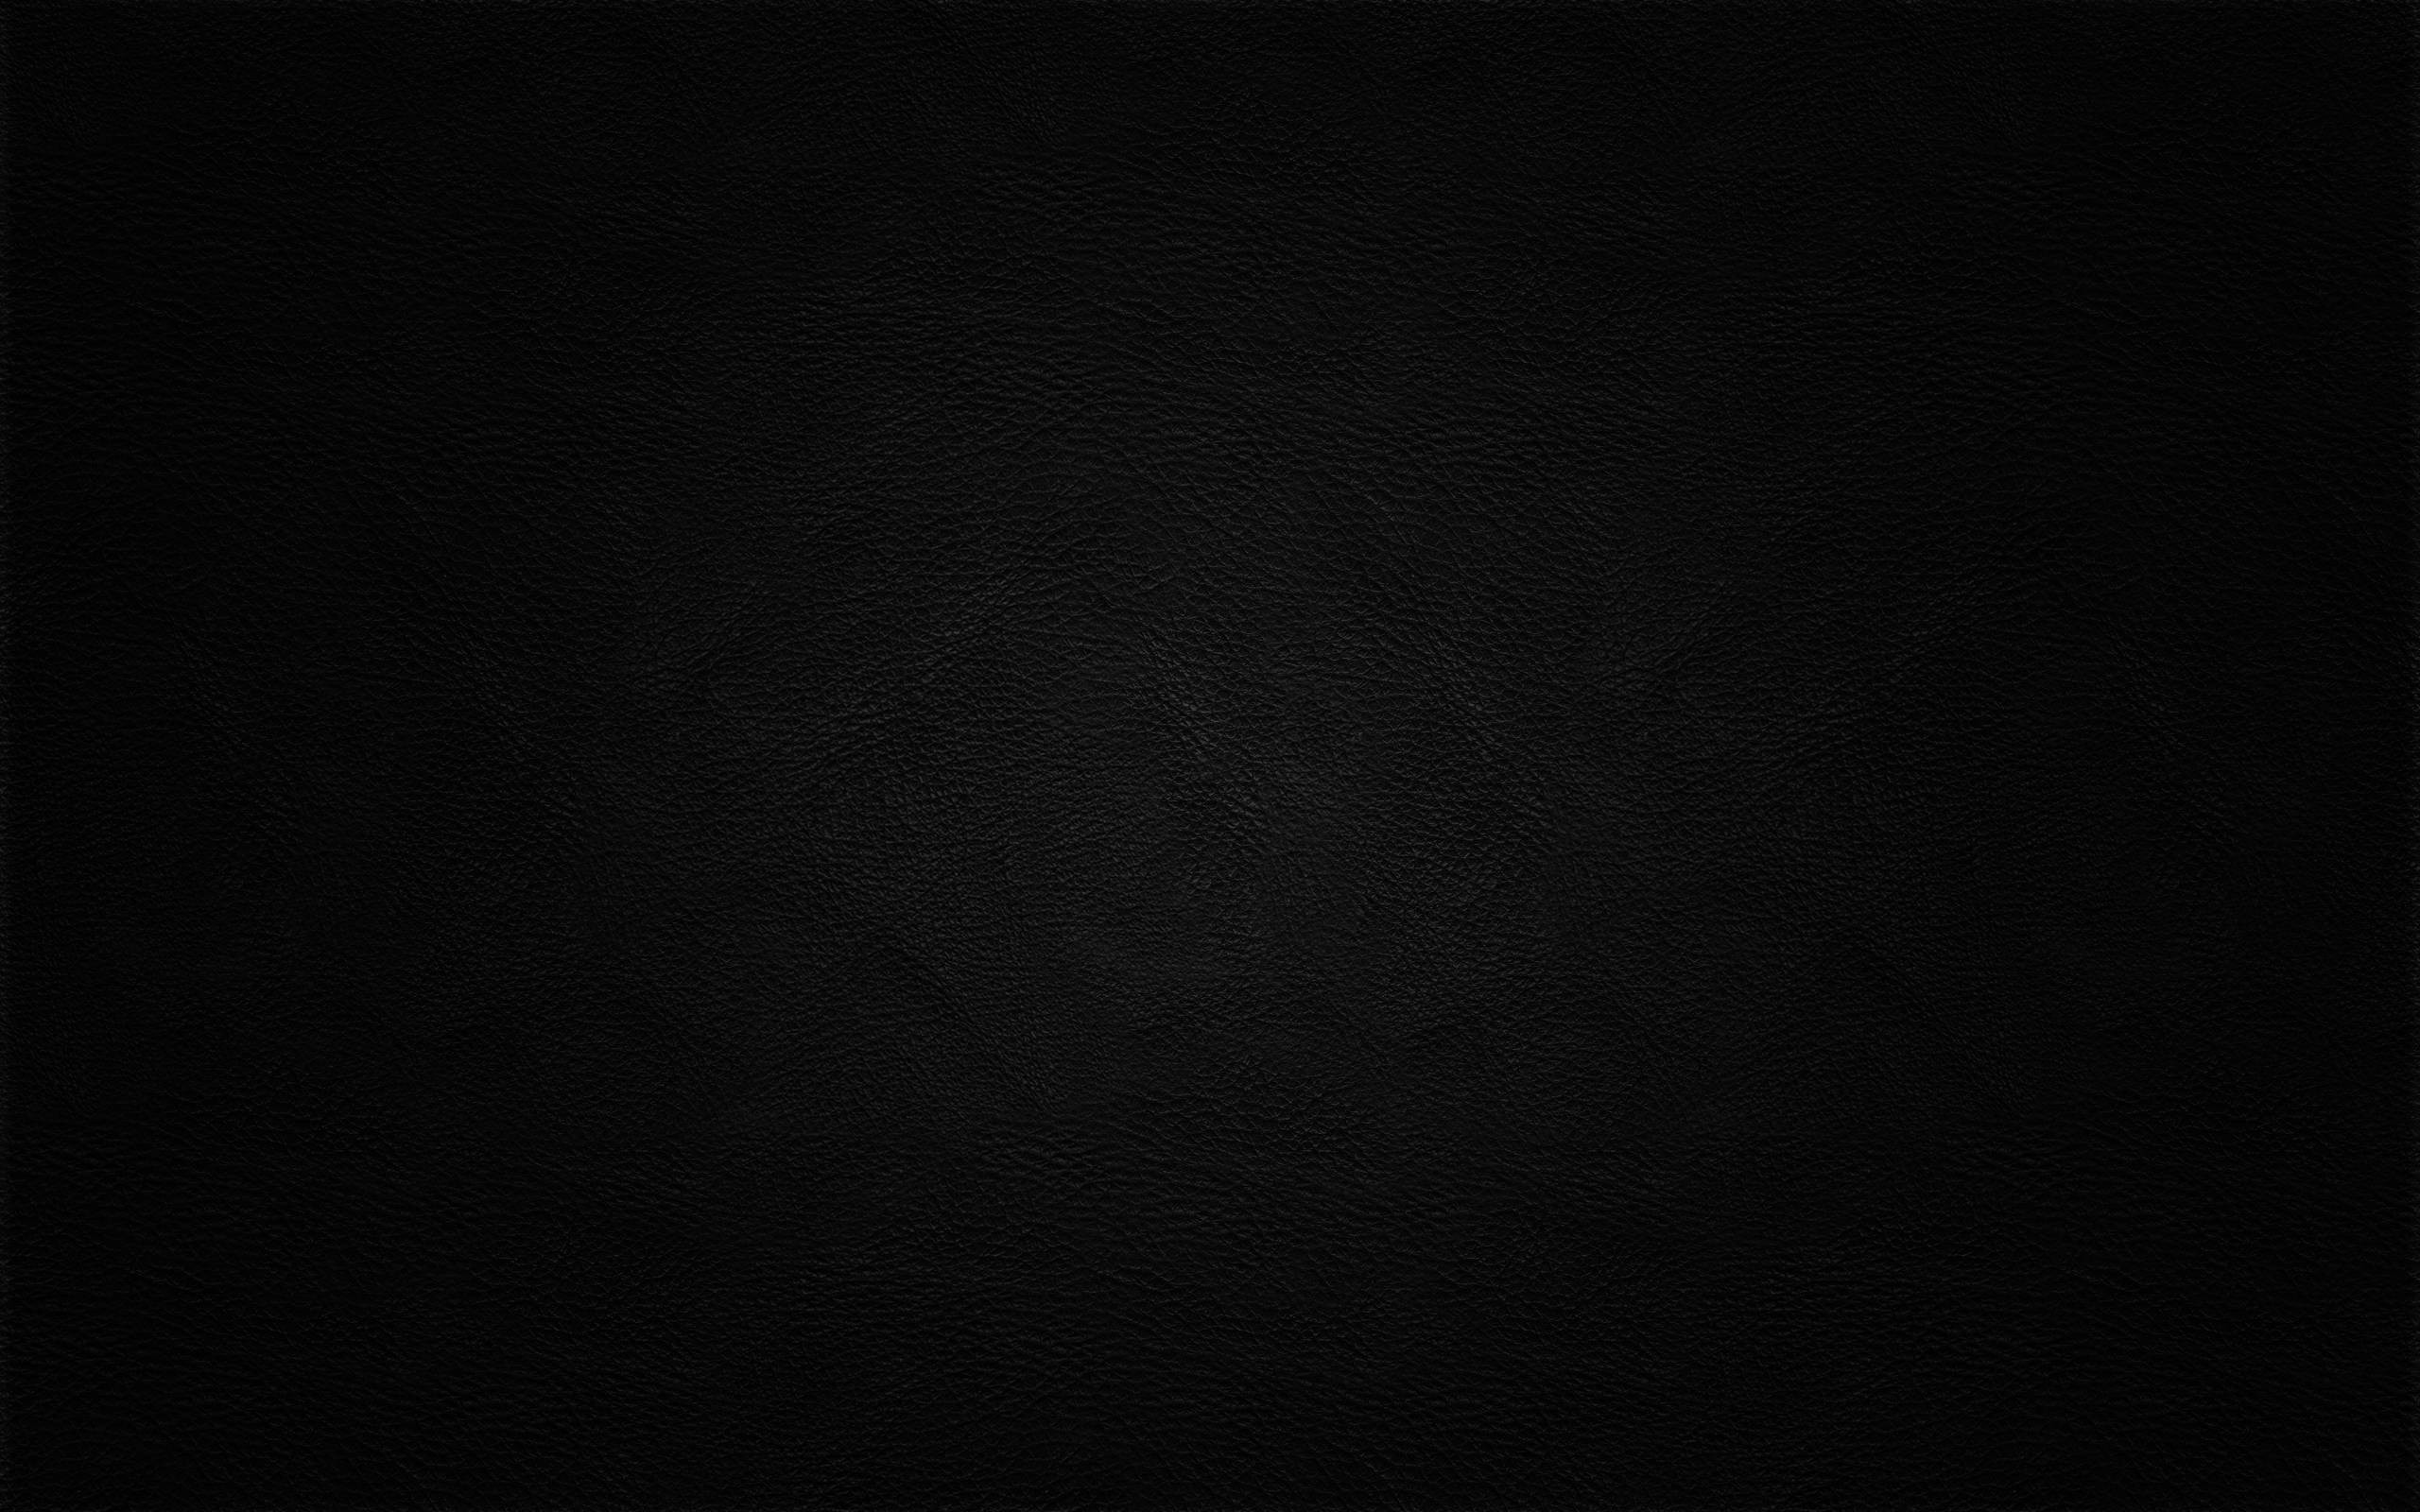 Dark Wallpaper Hd 1920x1080 Glossy Black Wallpaper 72 Images